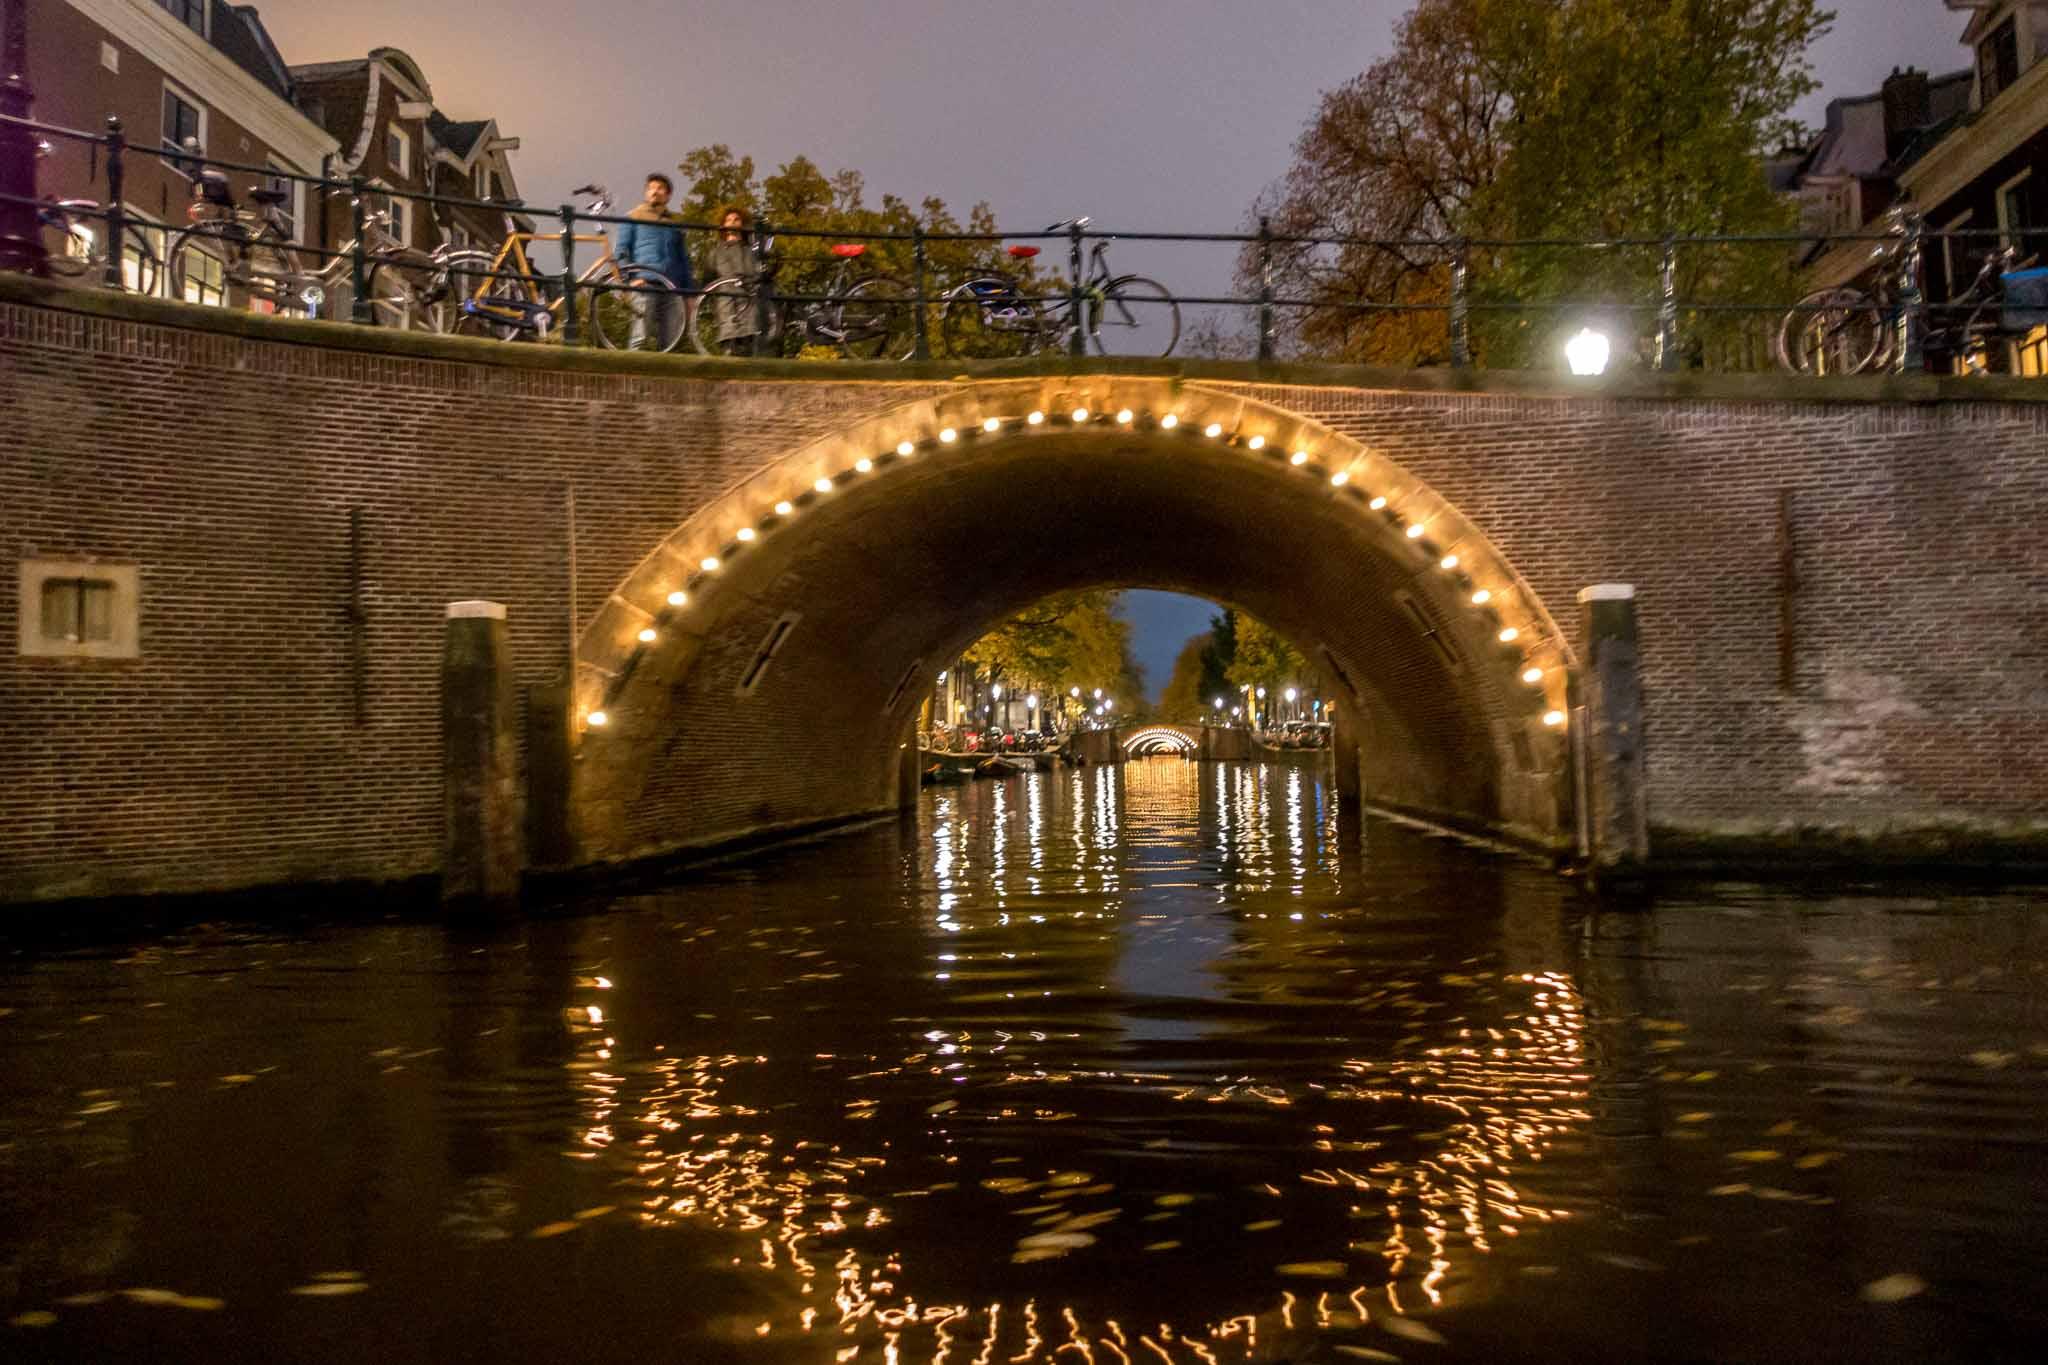 Illuminated bridge over a canal at night